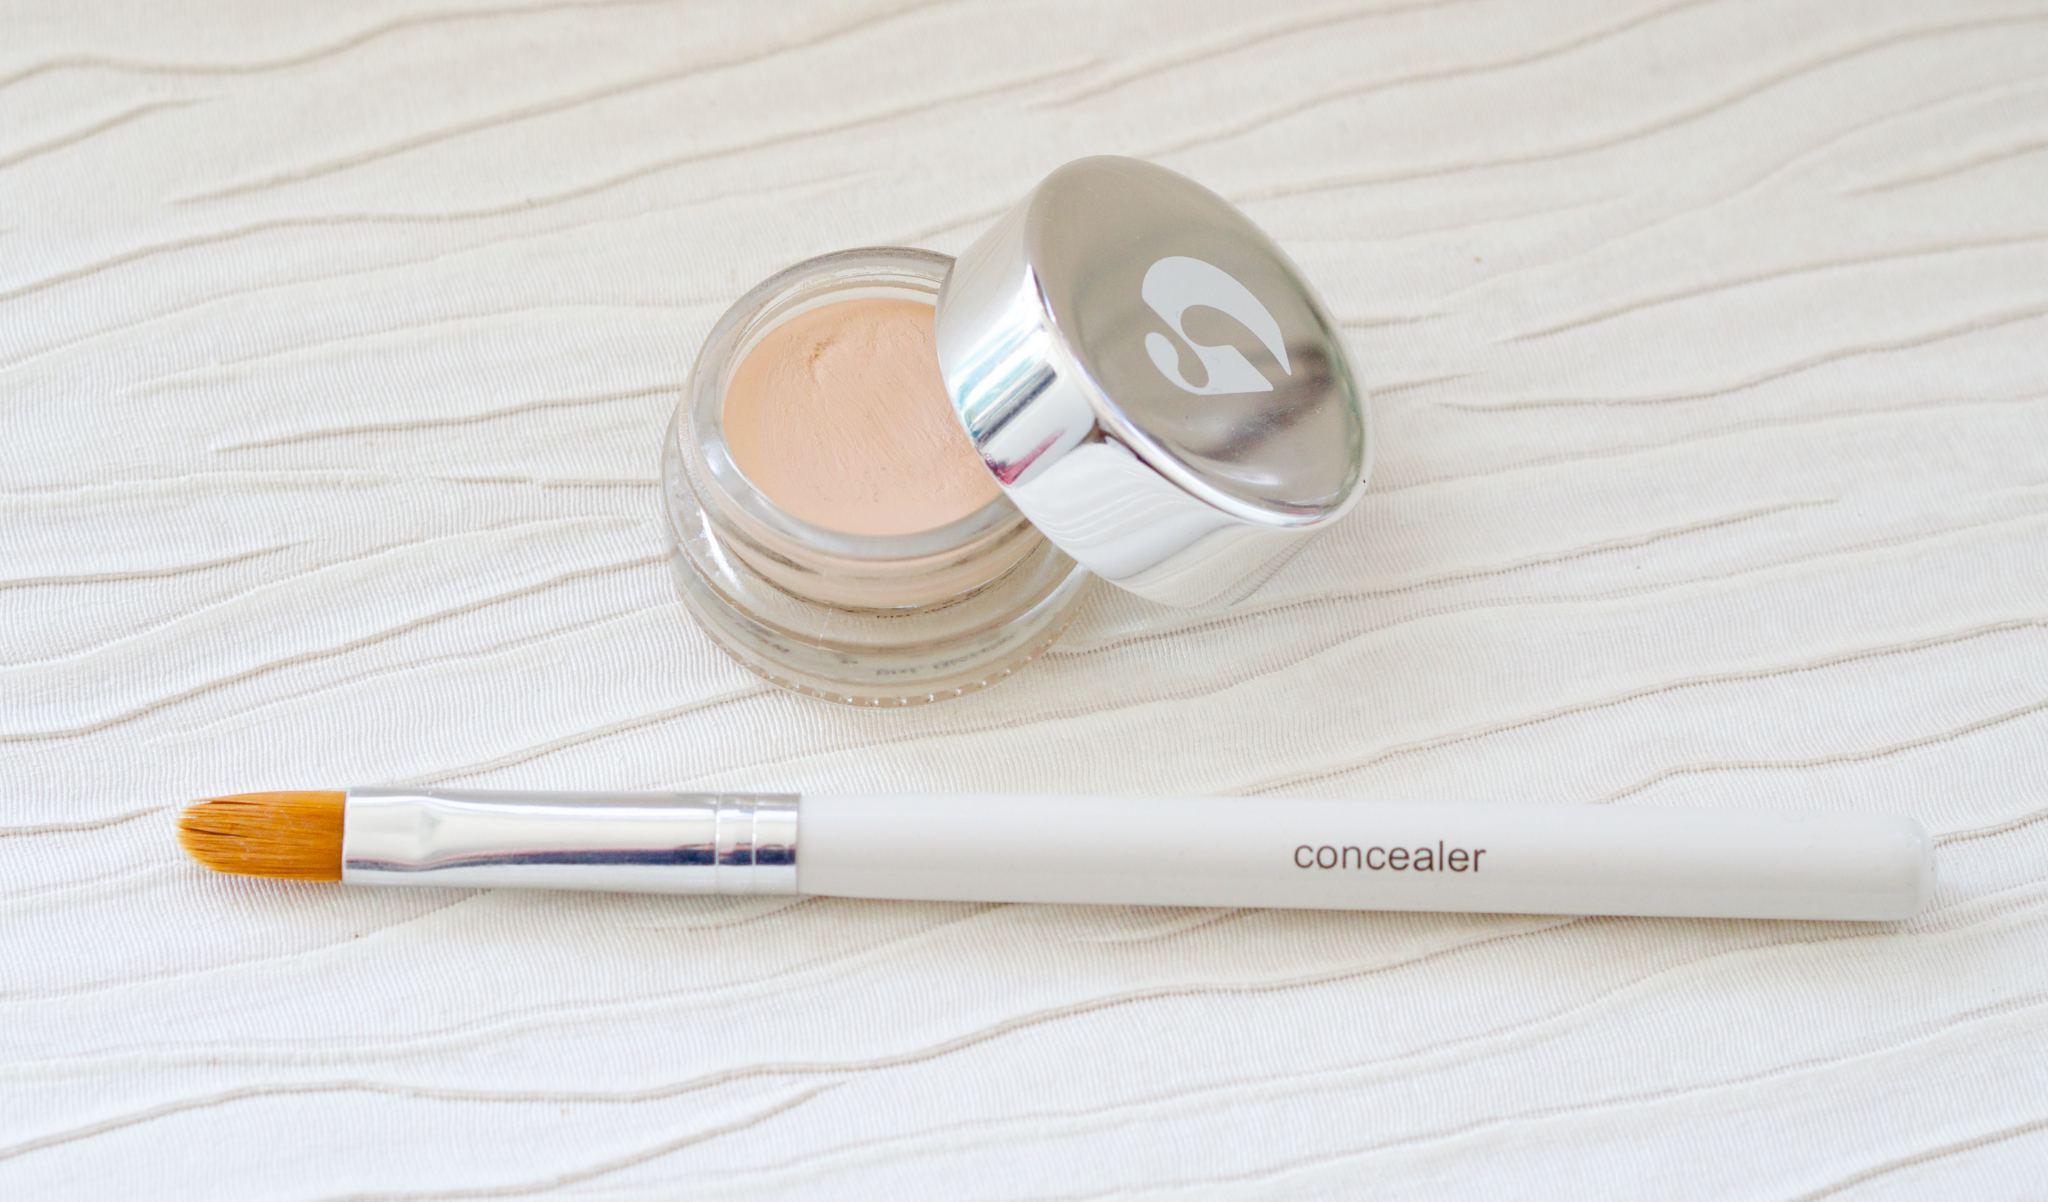 Glossier mini haul - stretch concealer